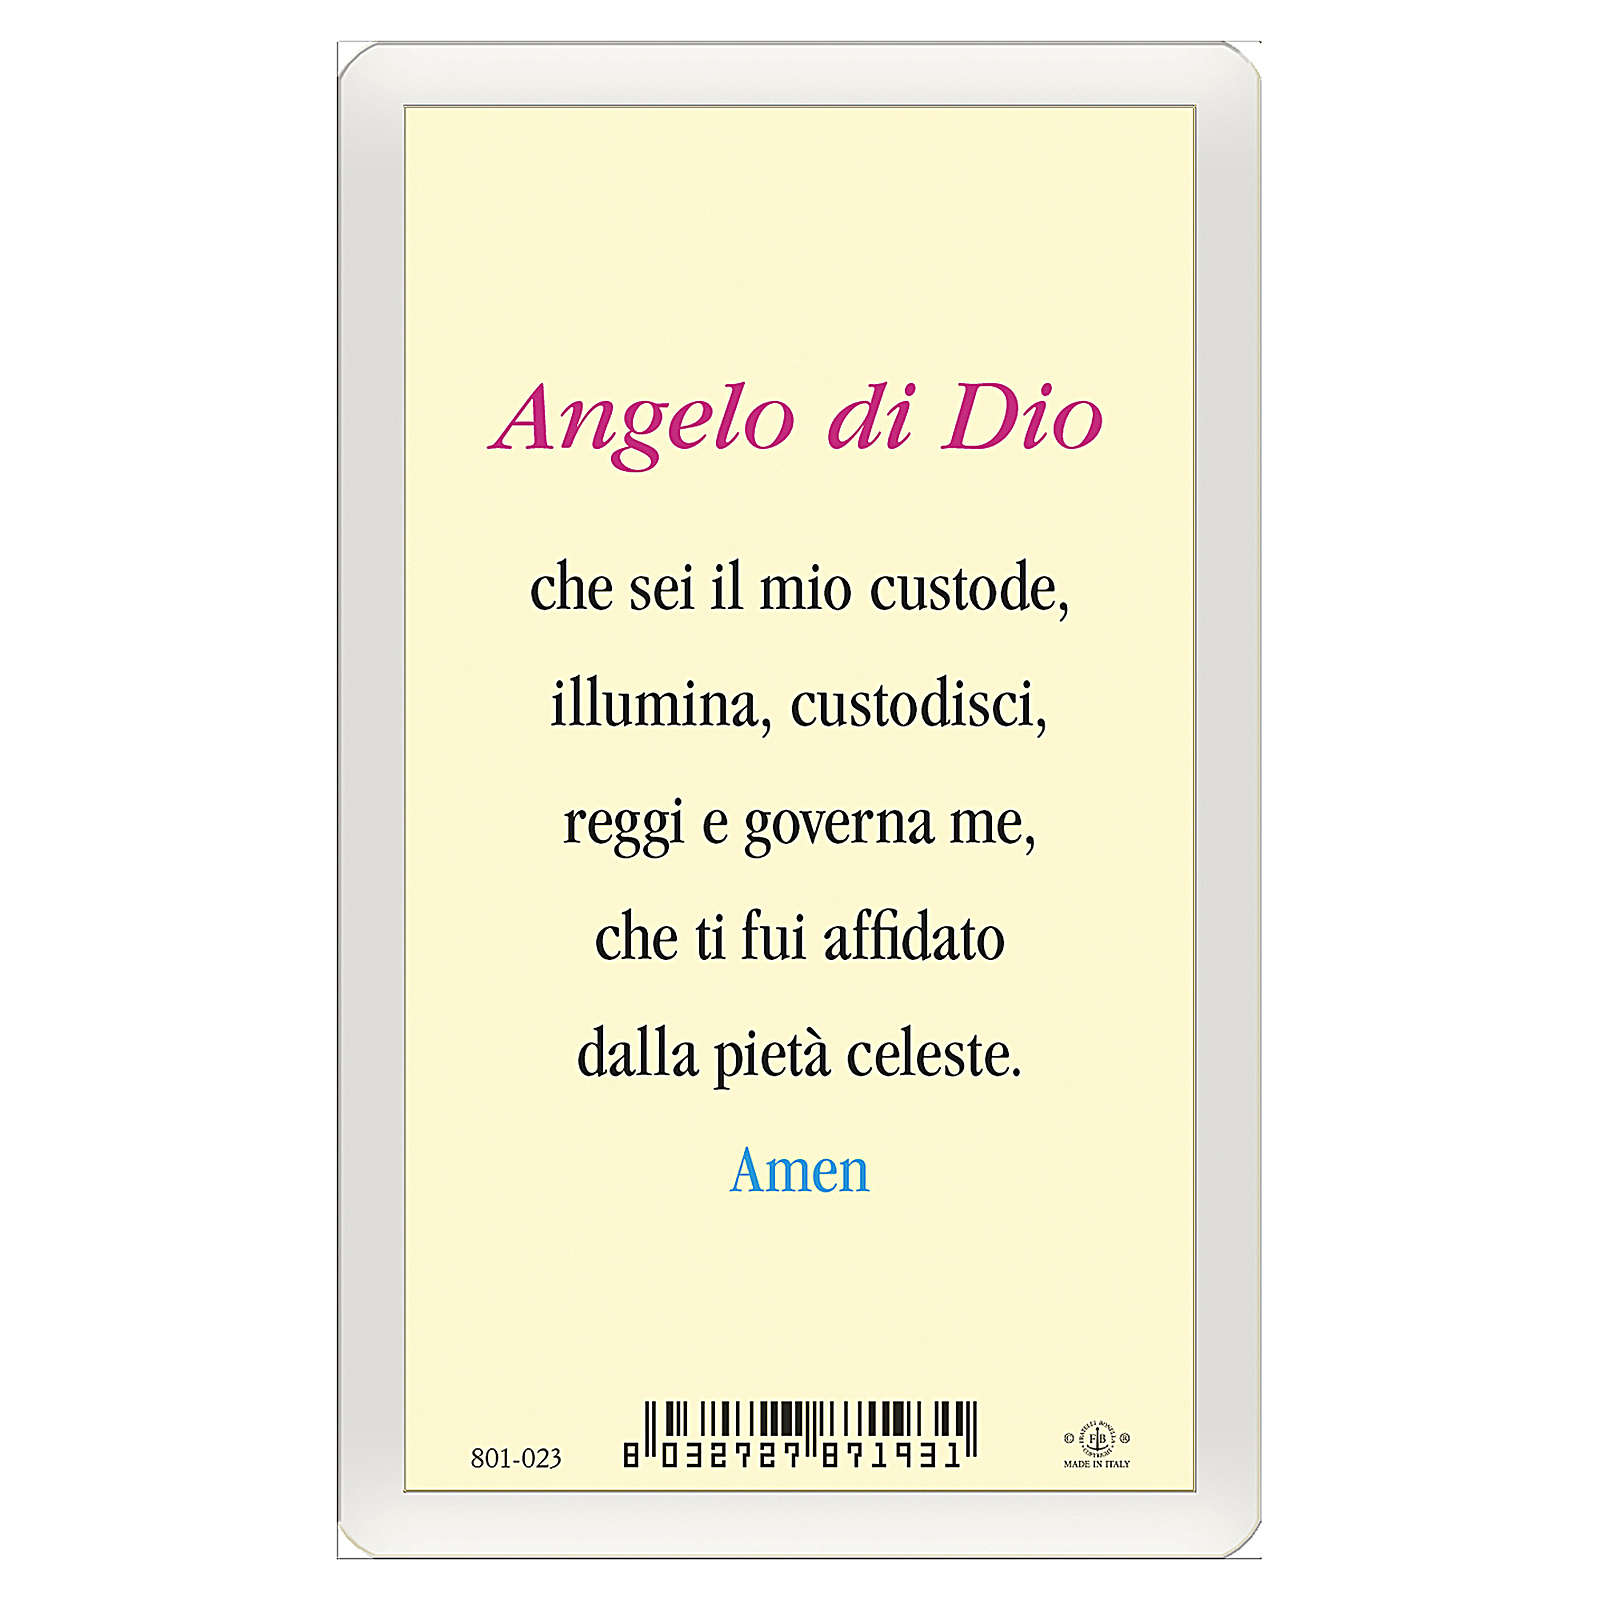 Santino Angelo Custode Angelo di Dio ITA 10x5 4